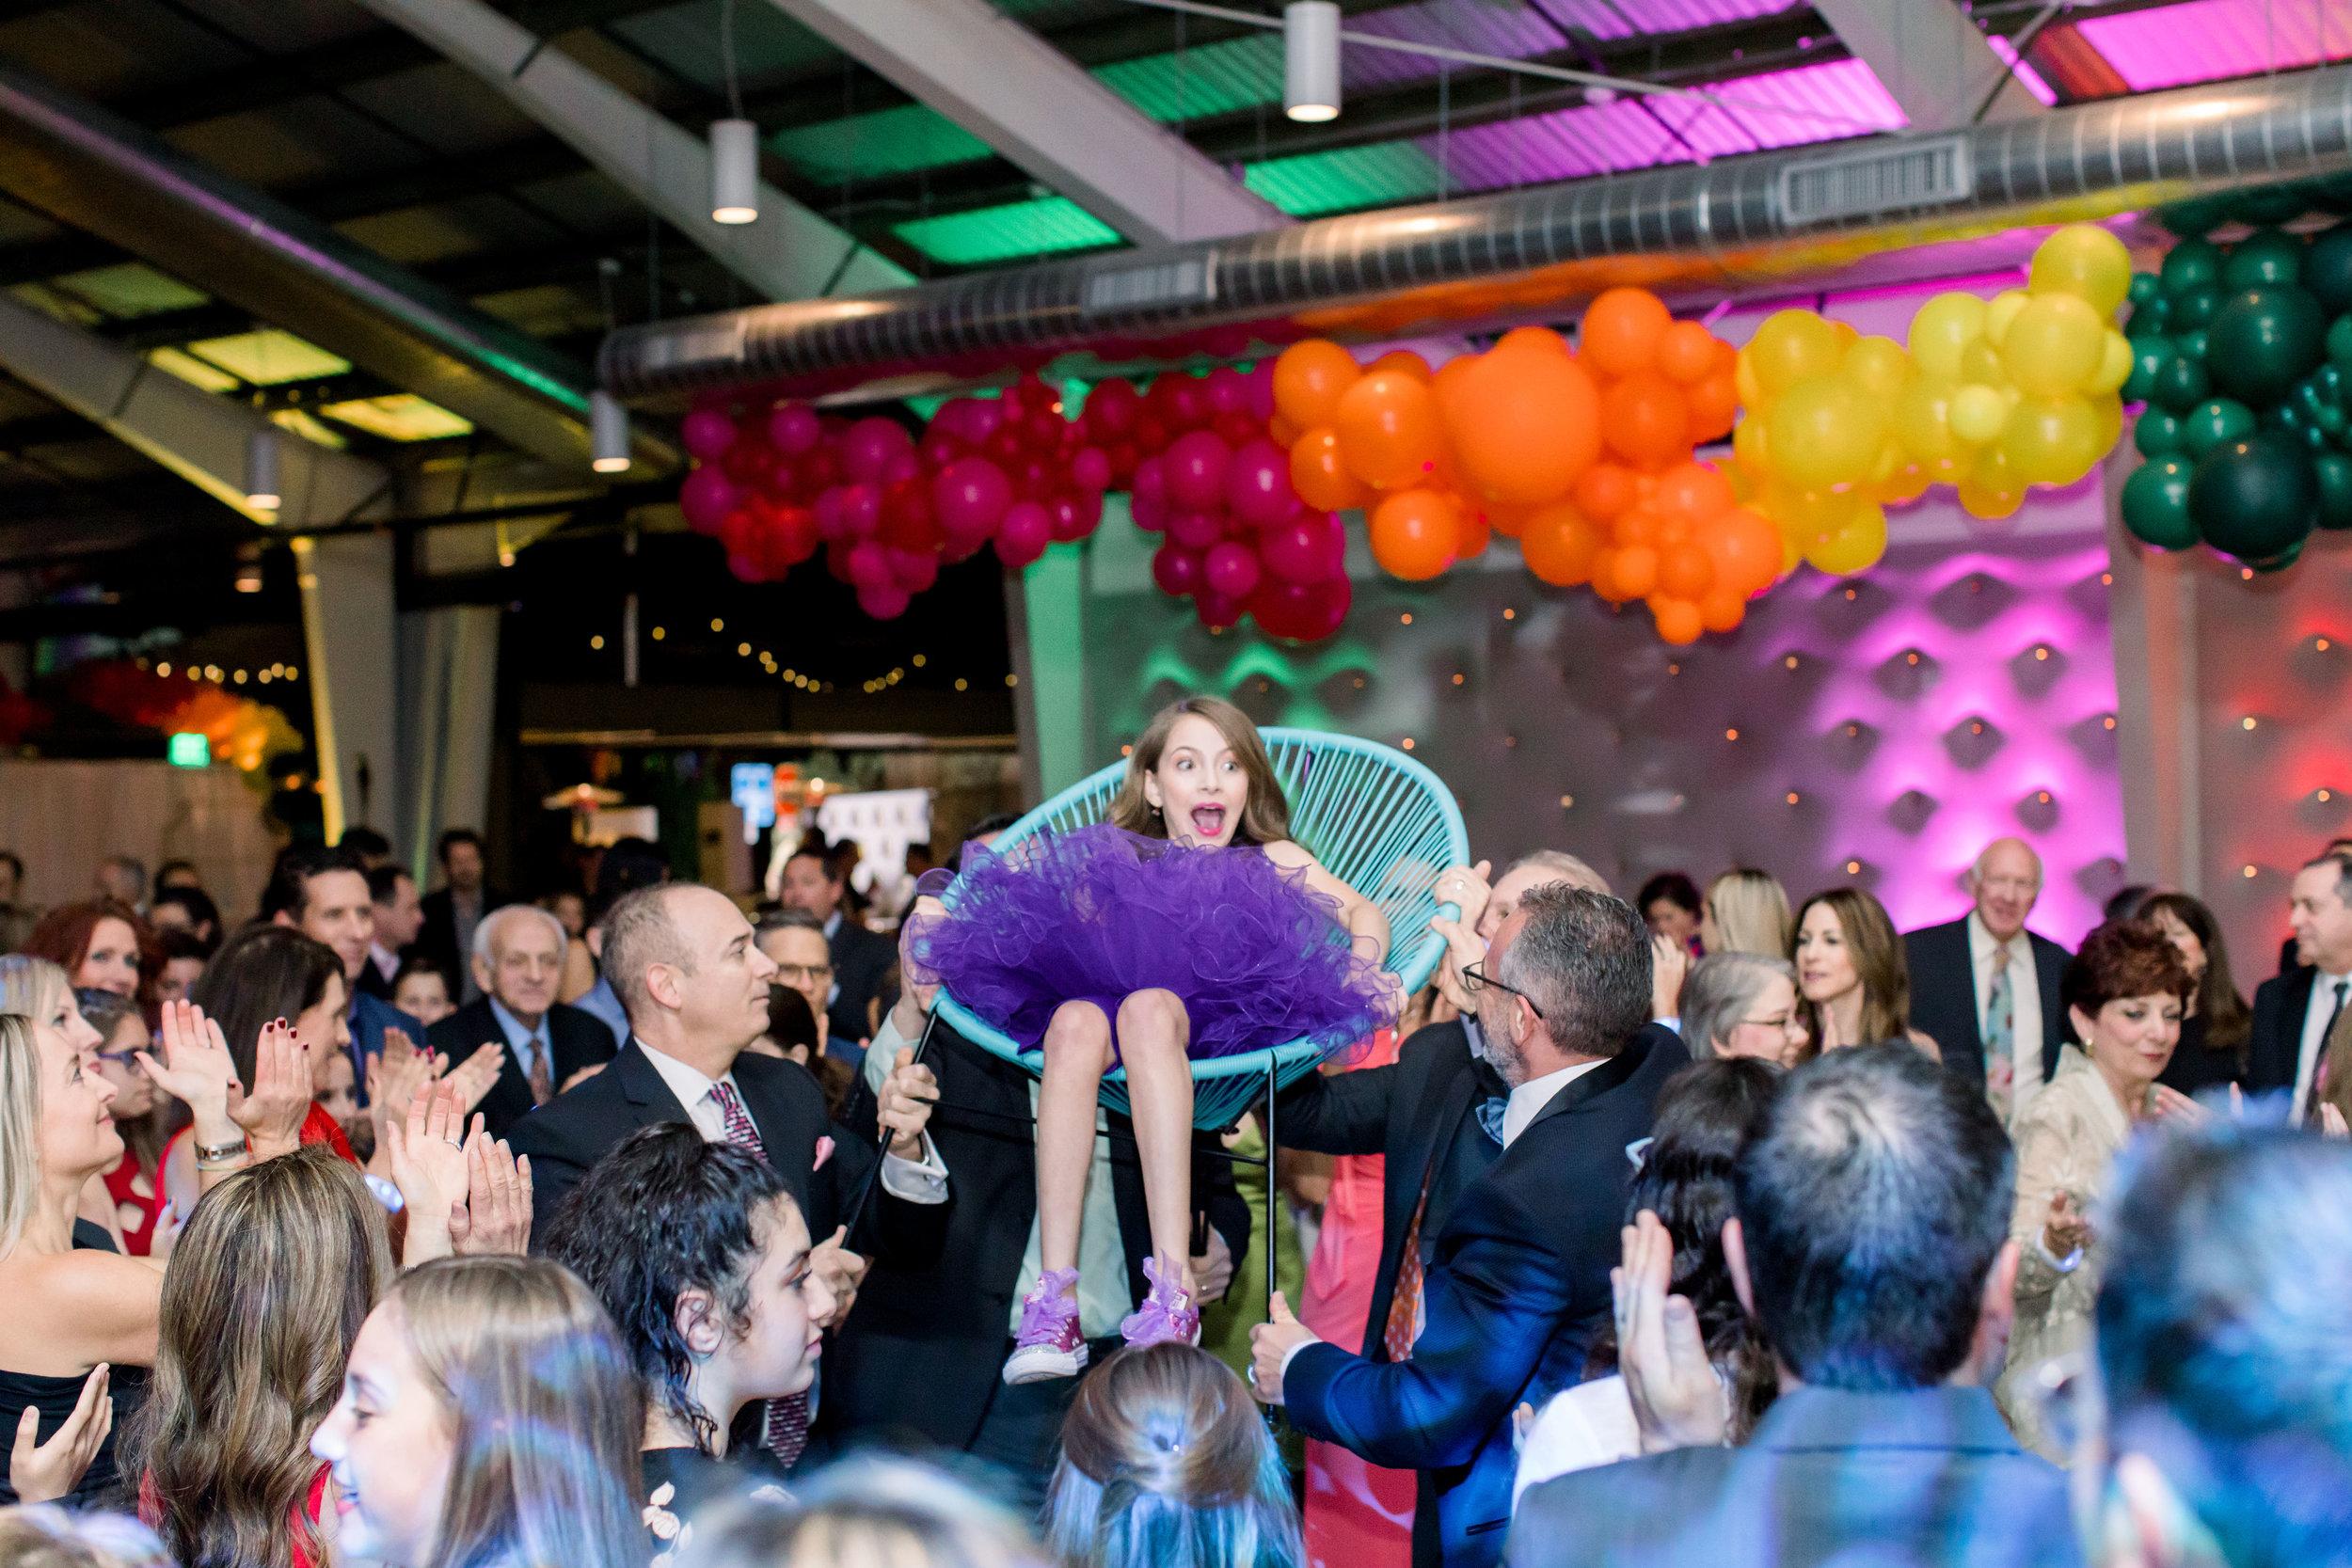 38 bat mitzvah girl lift in chair hora dance hava nagila surprised girl purple tulle skirt bat mitzvah dance tradition Life Design Events photos by Stephanie Heymann Photography.jpg